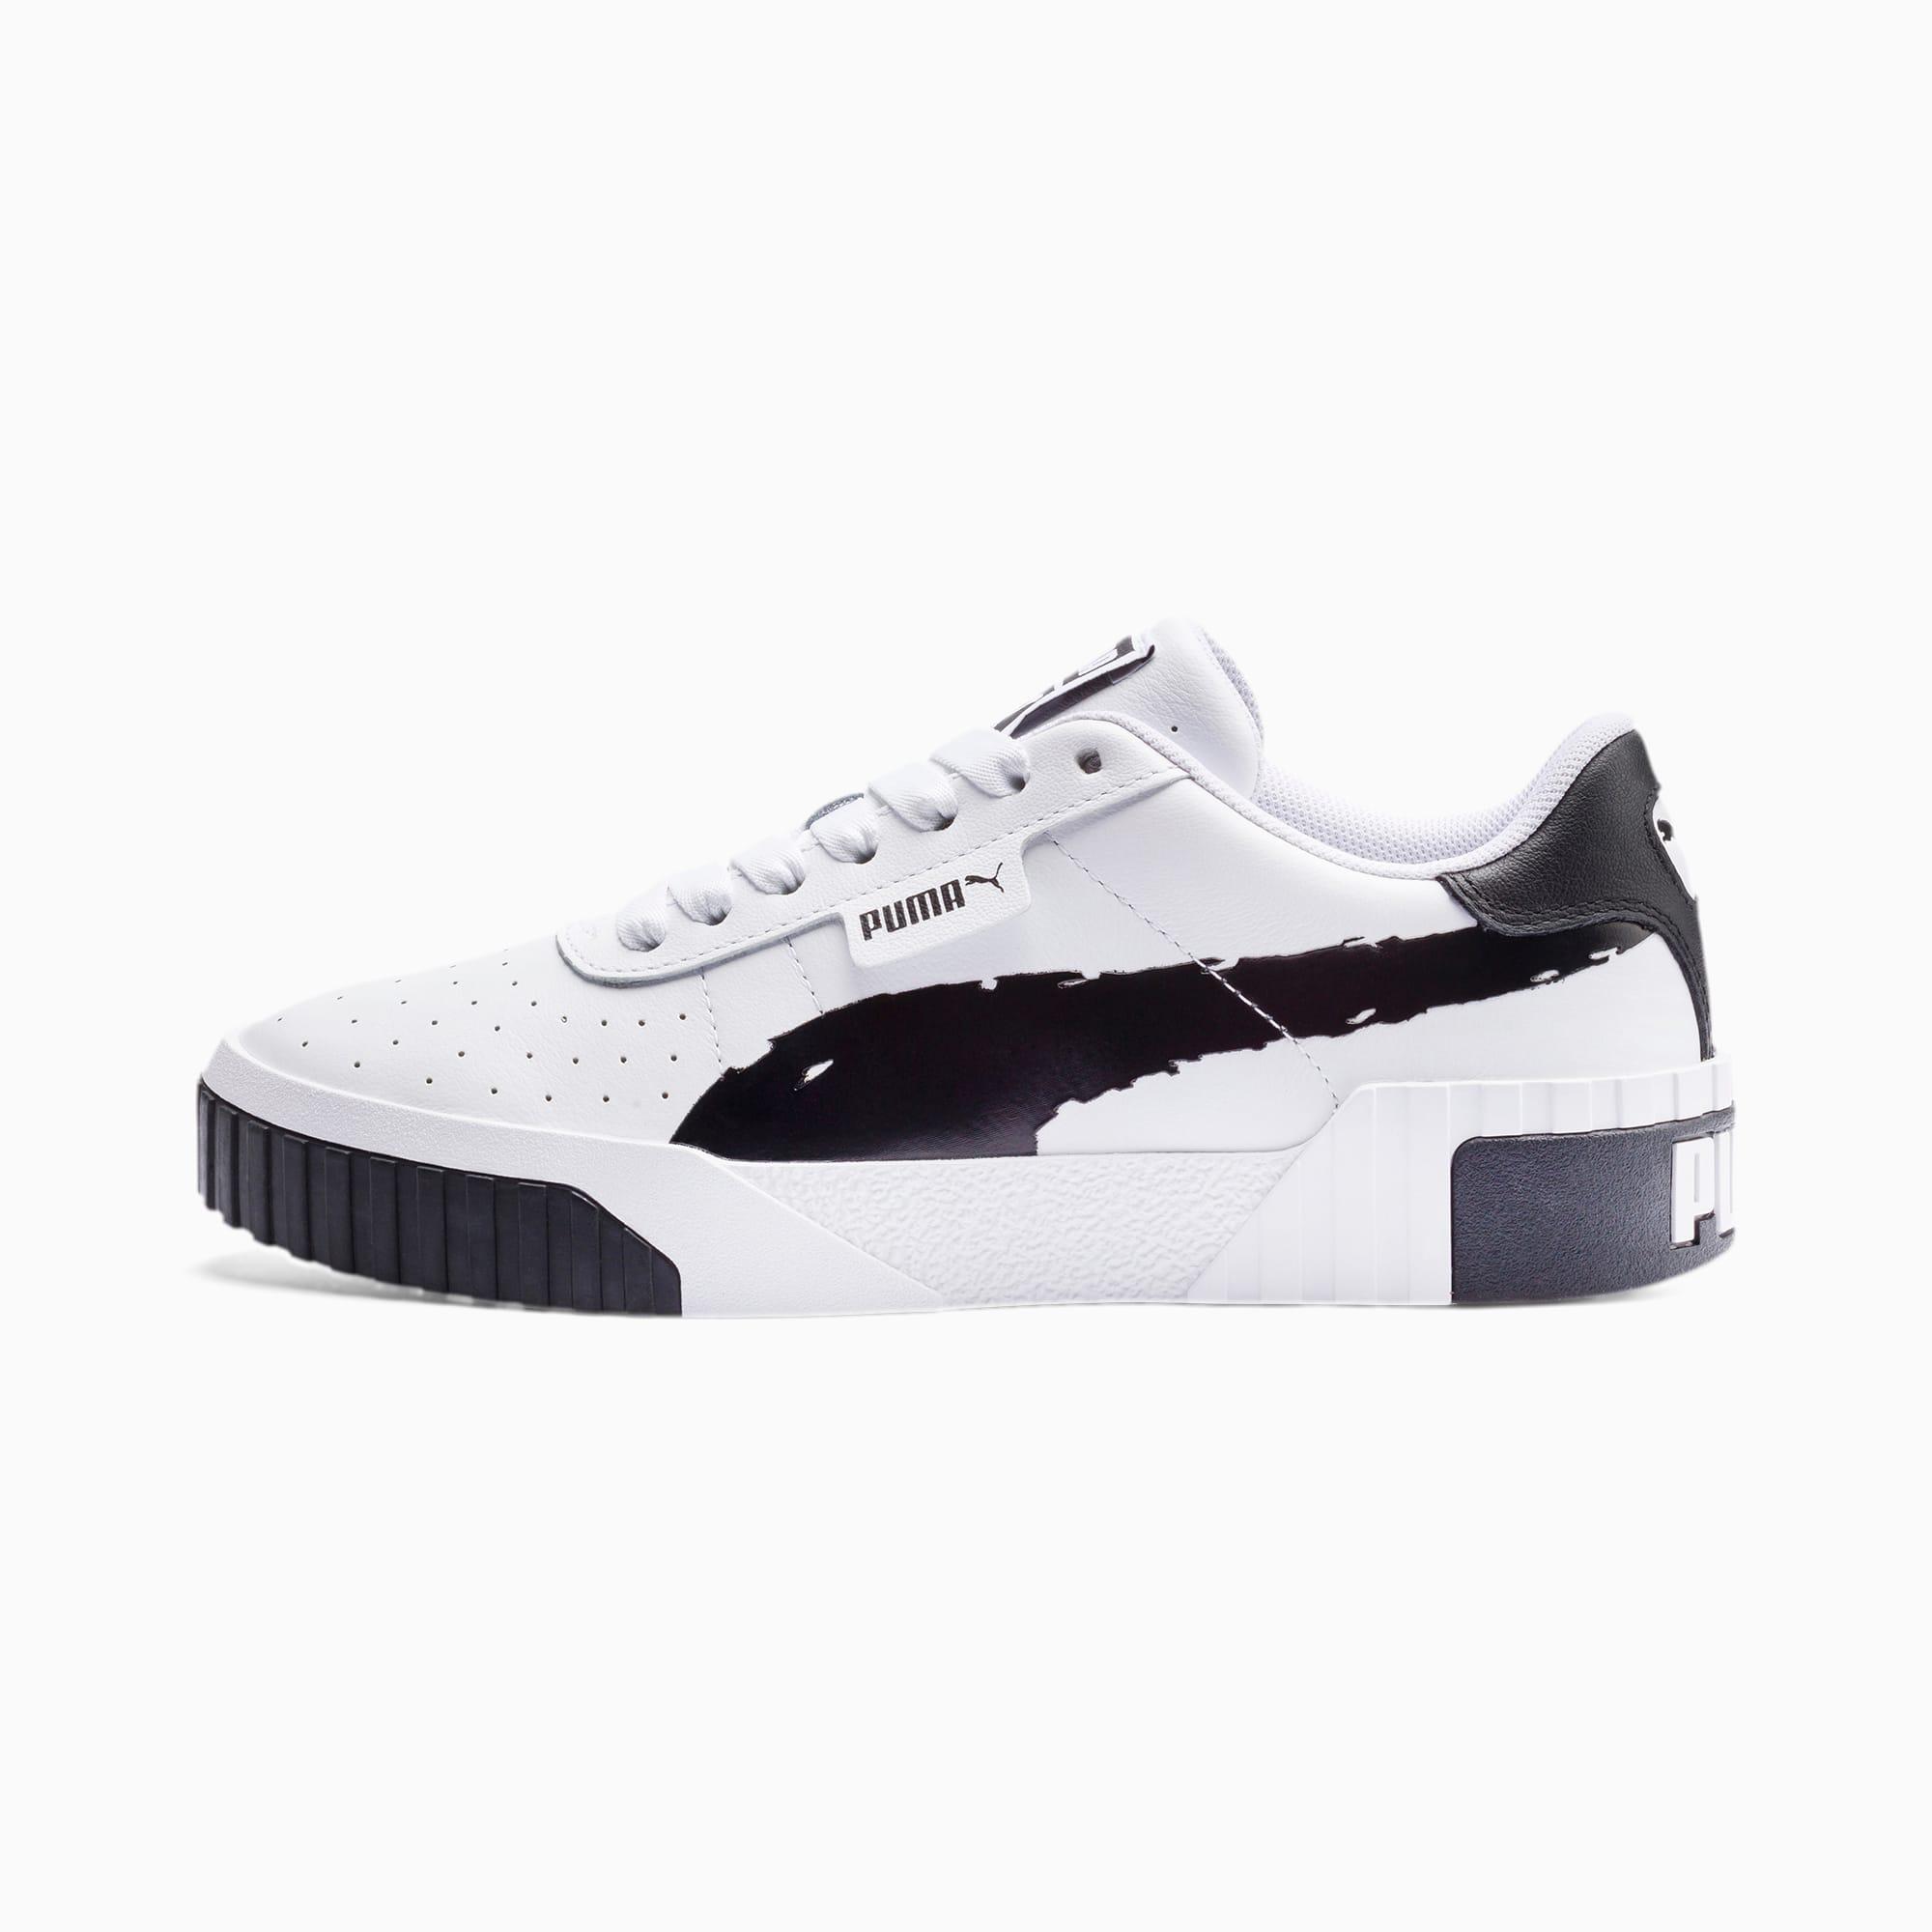 Puma Cali Women's Sneakers Puma BlackPuma White